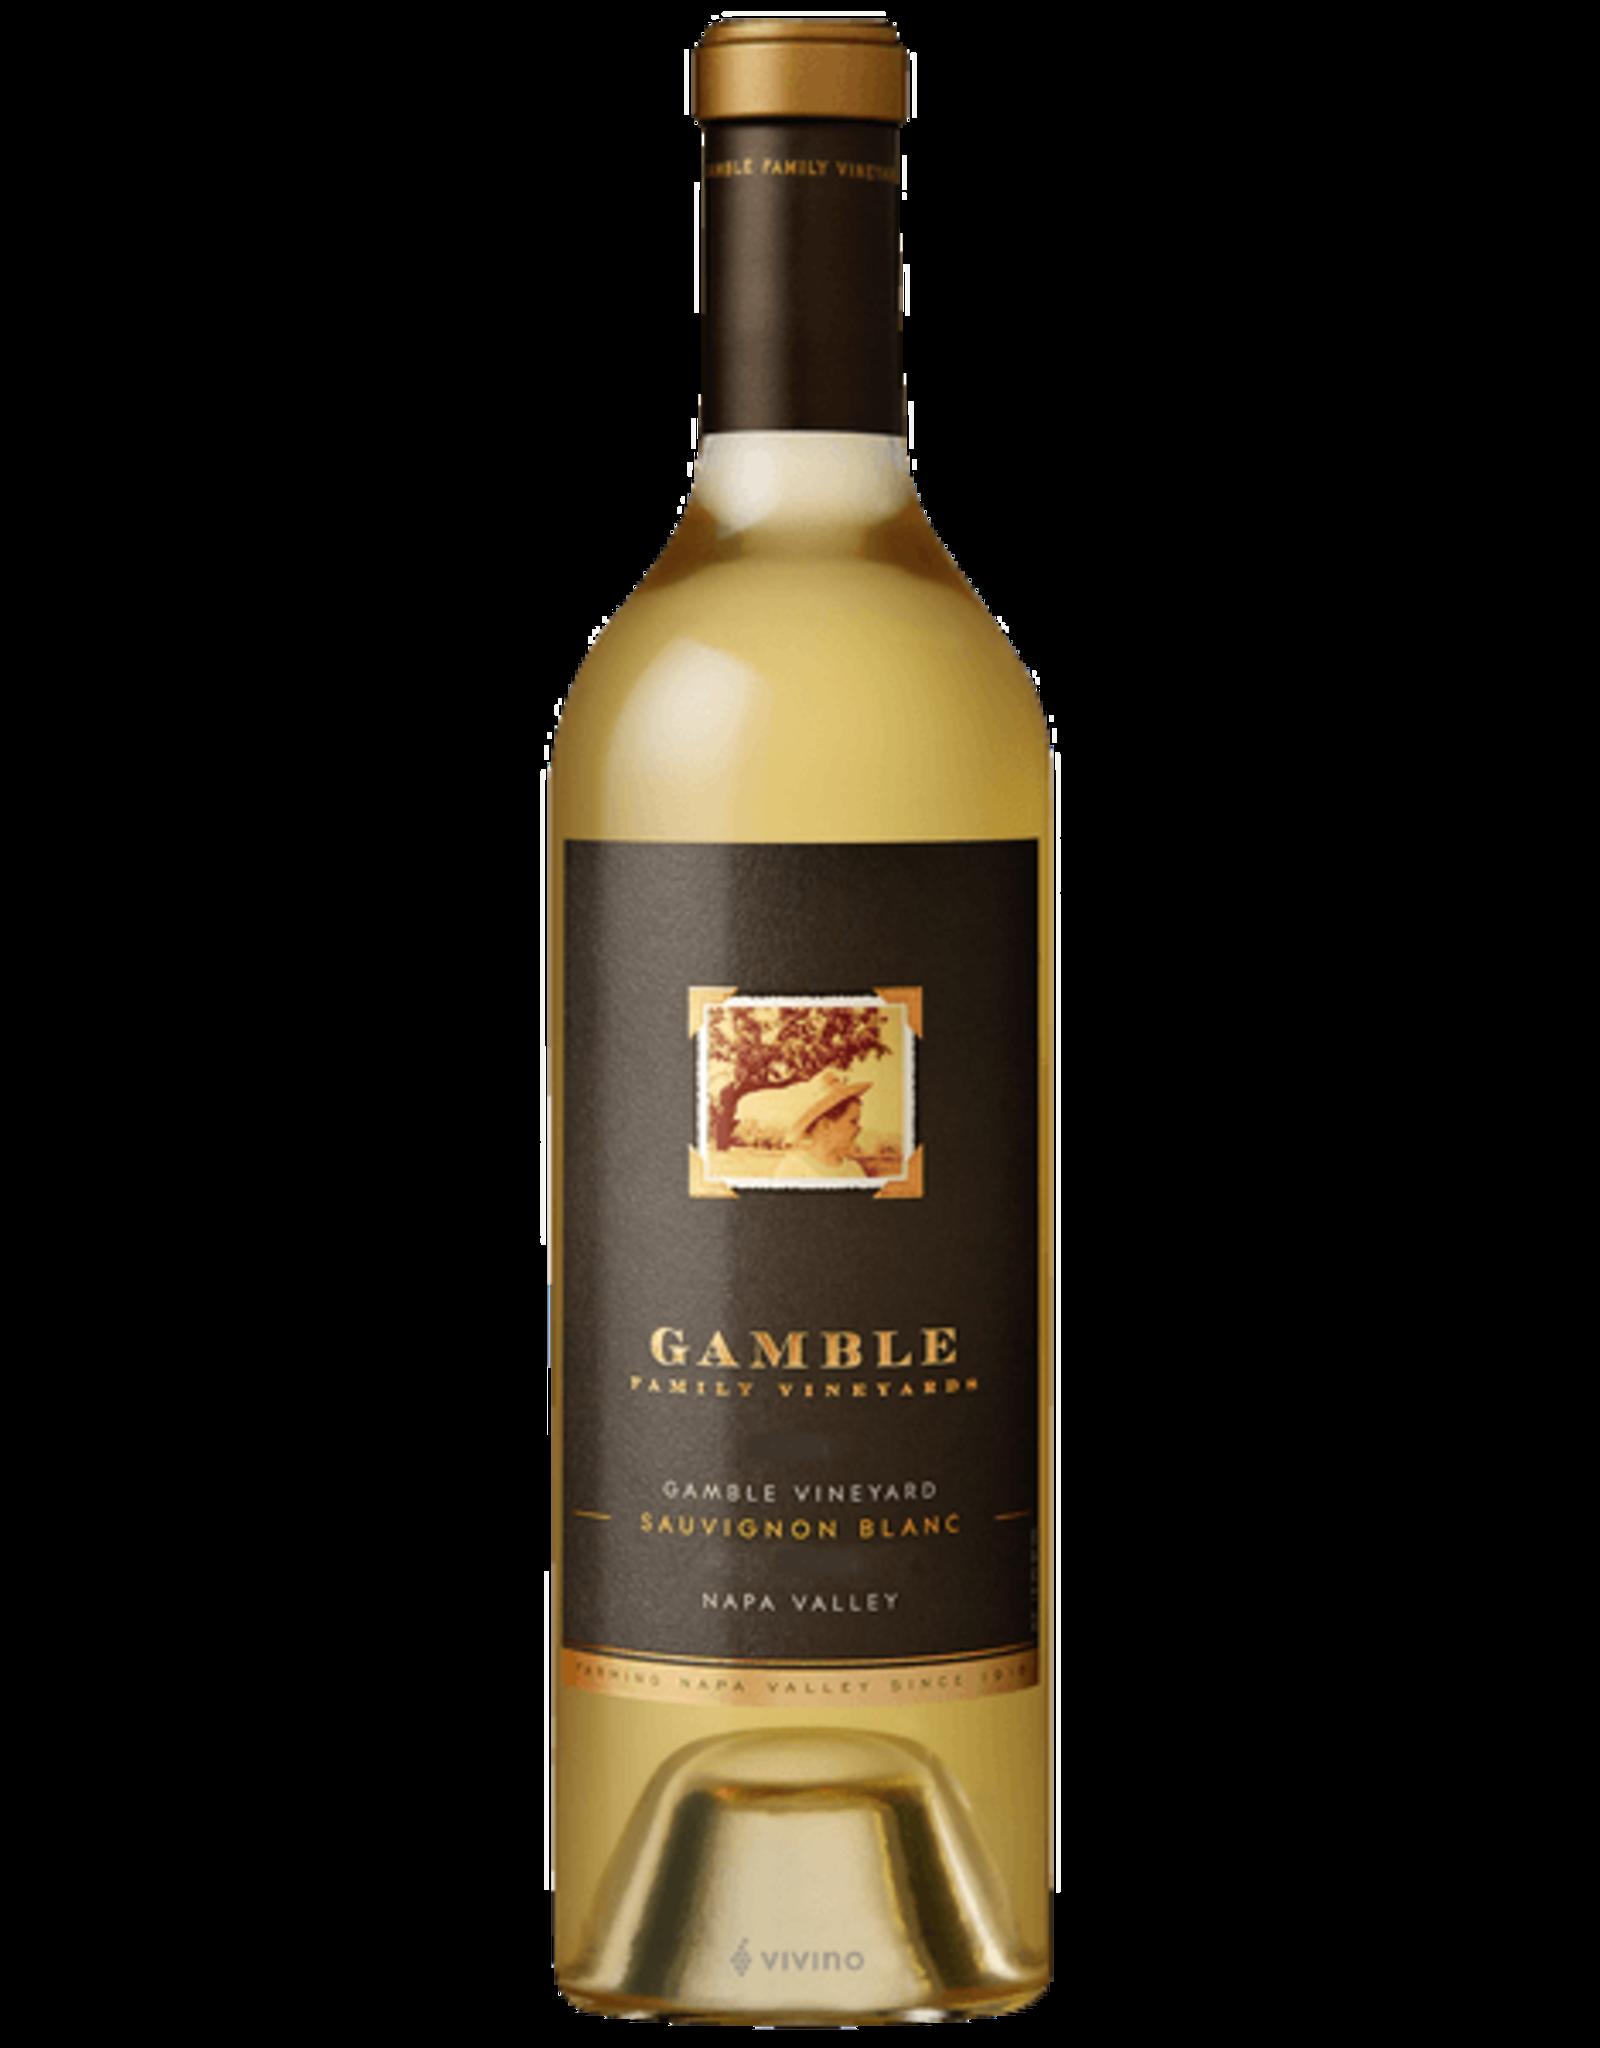 Gamble Sauvignon Blanc